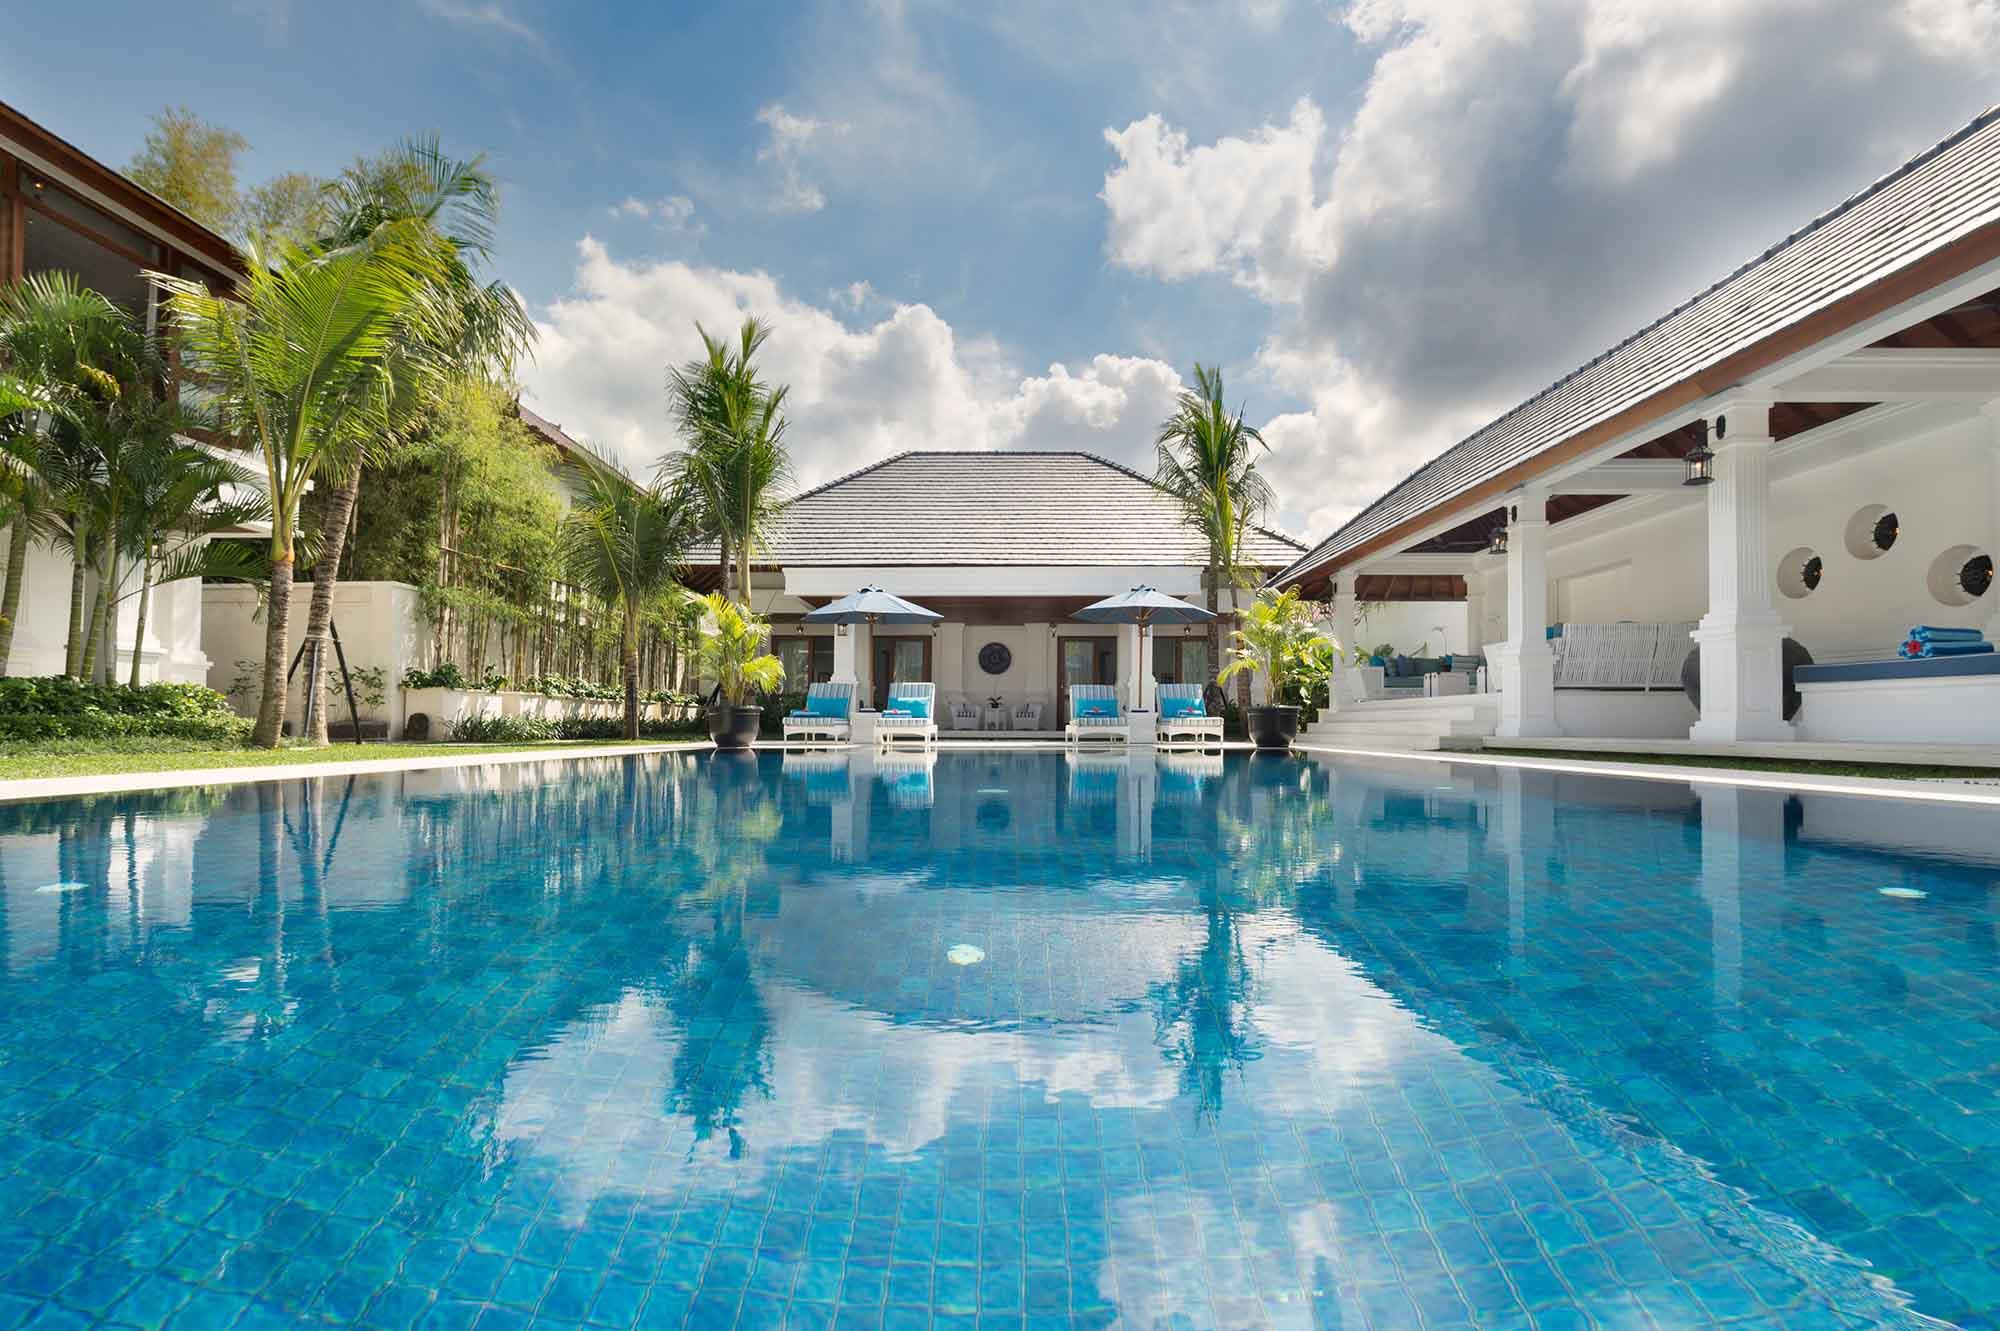 Villa windu asri 6 bedroom villa seminyak ultimate bali for Villas with swimming pool